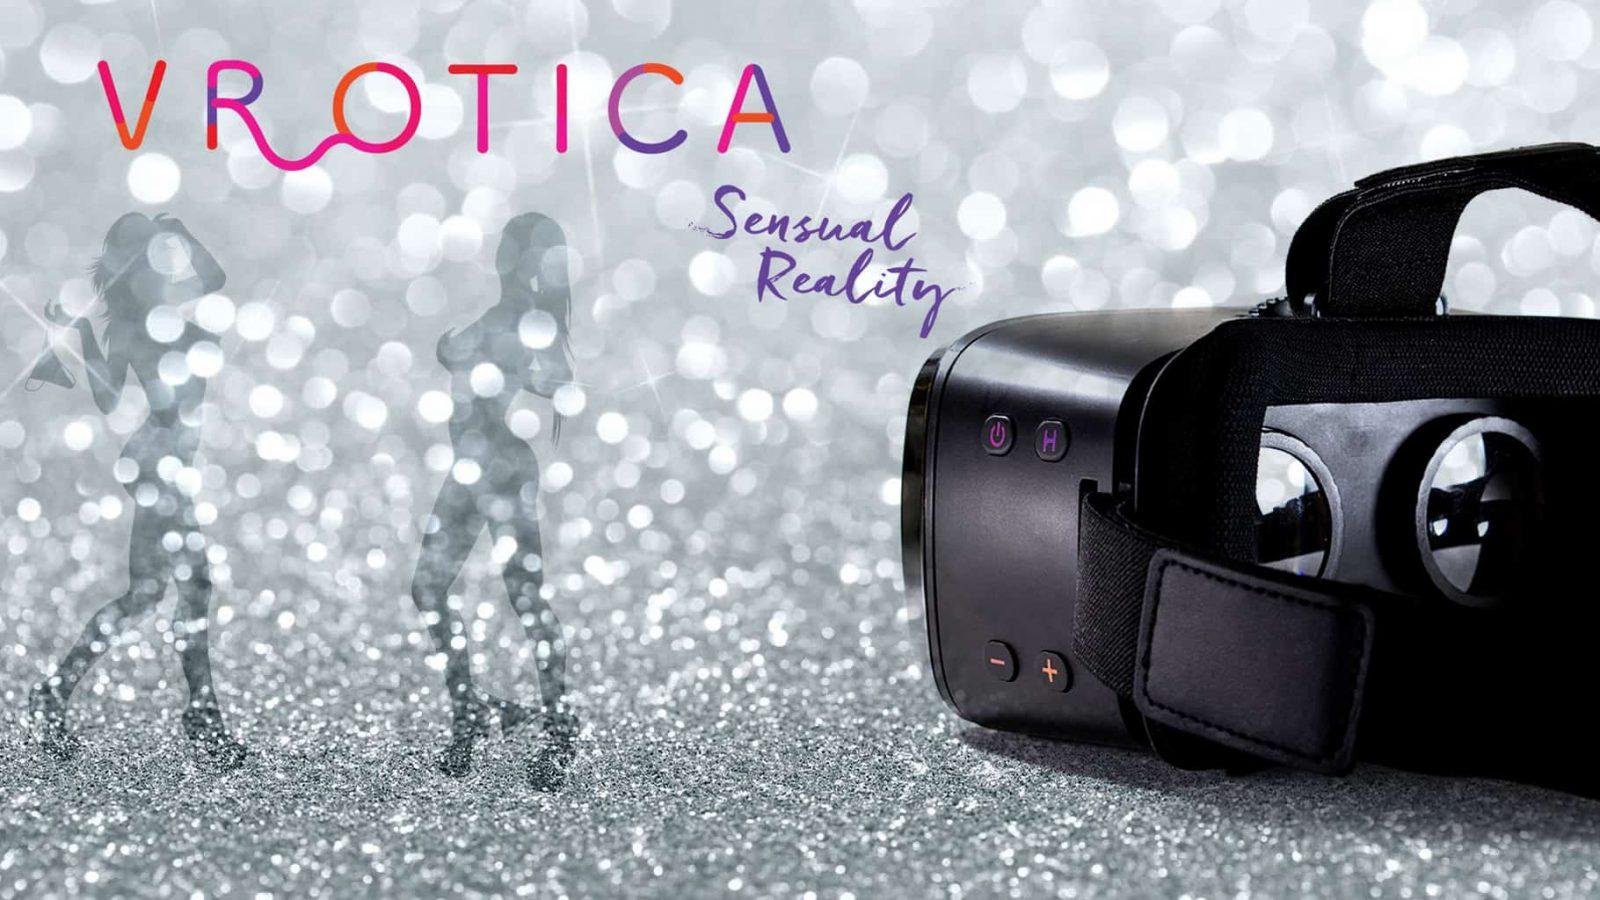 Vrotica VR Porn Headset